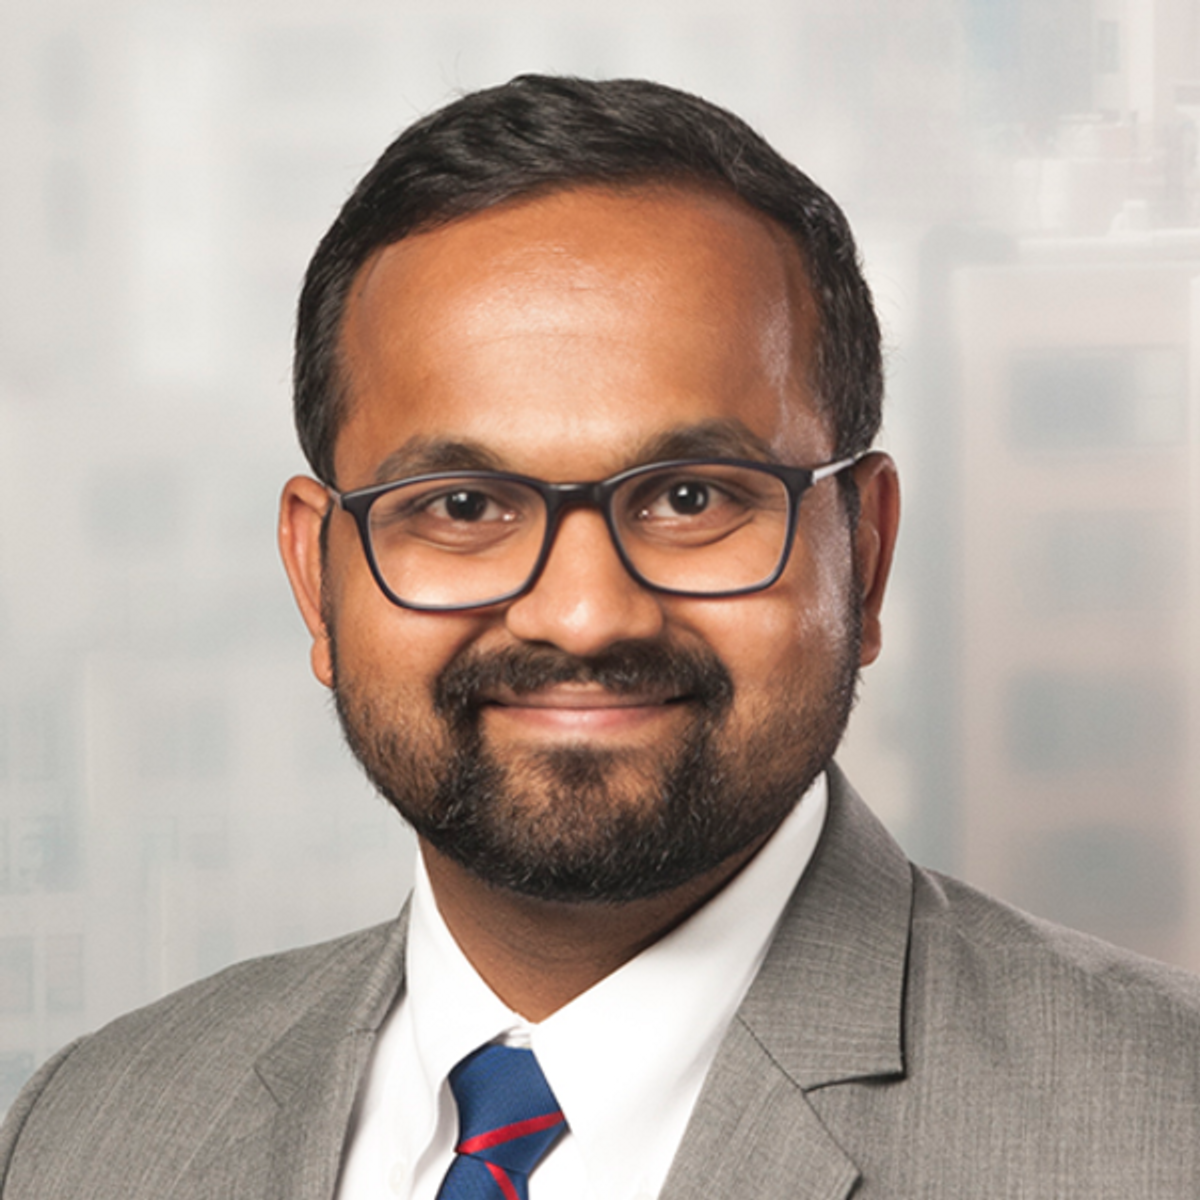 Photo of Nik Shah, Managing Partner at NPS Capital